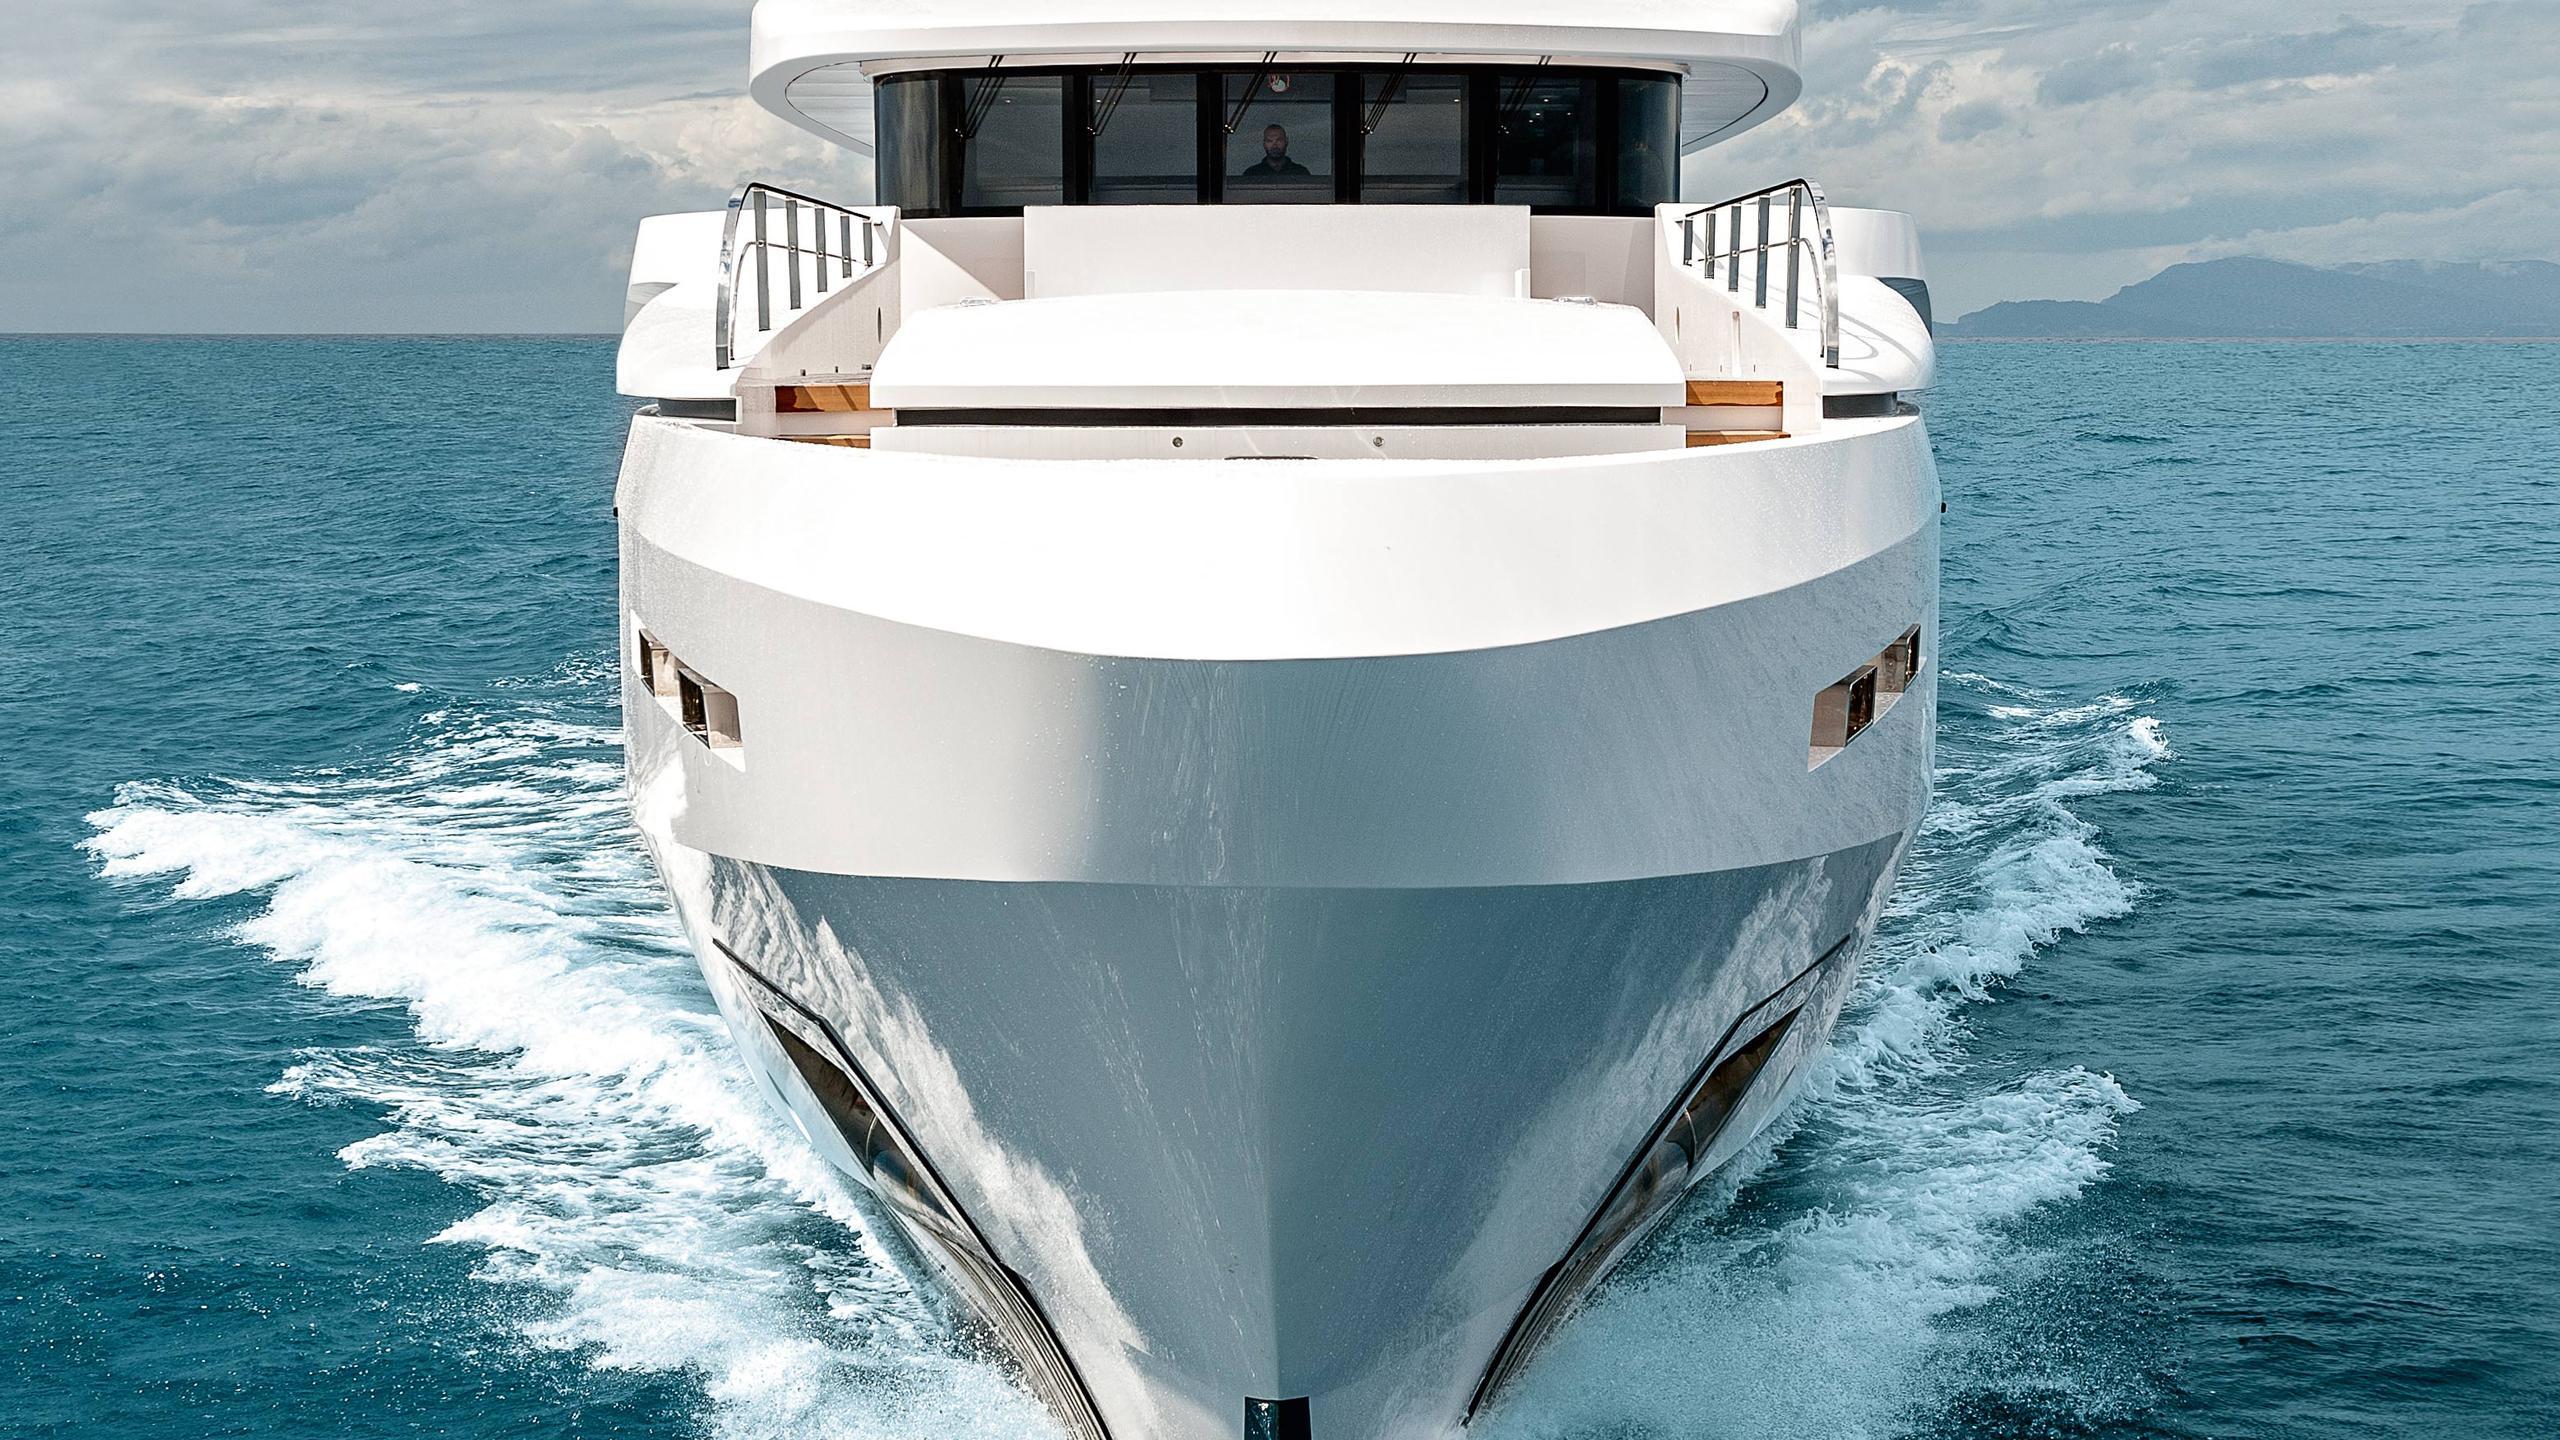 entourage-motor-yacht-admiral-the-italian-sea-group-2014-47m-bow